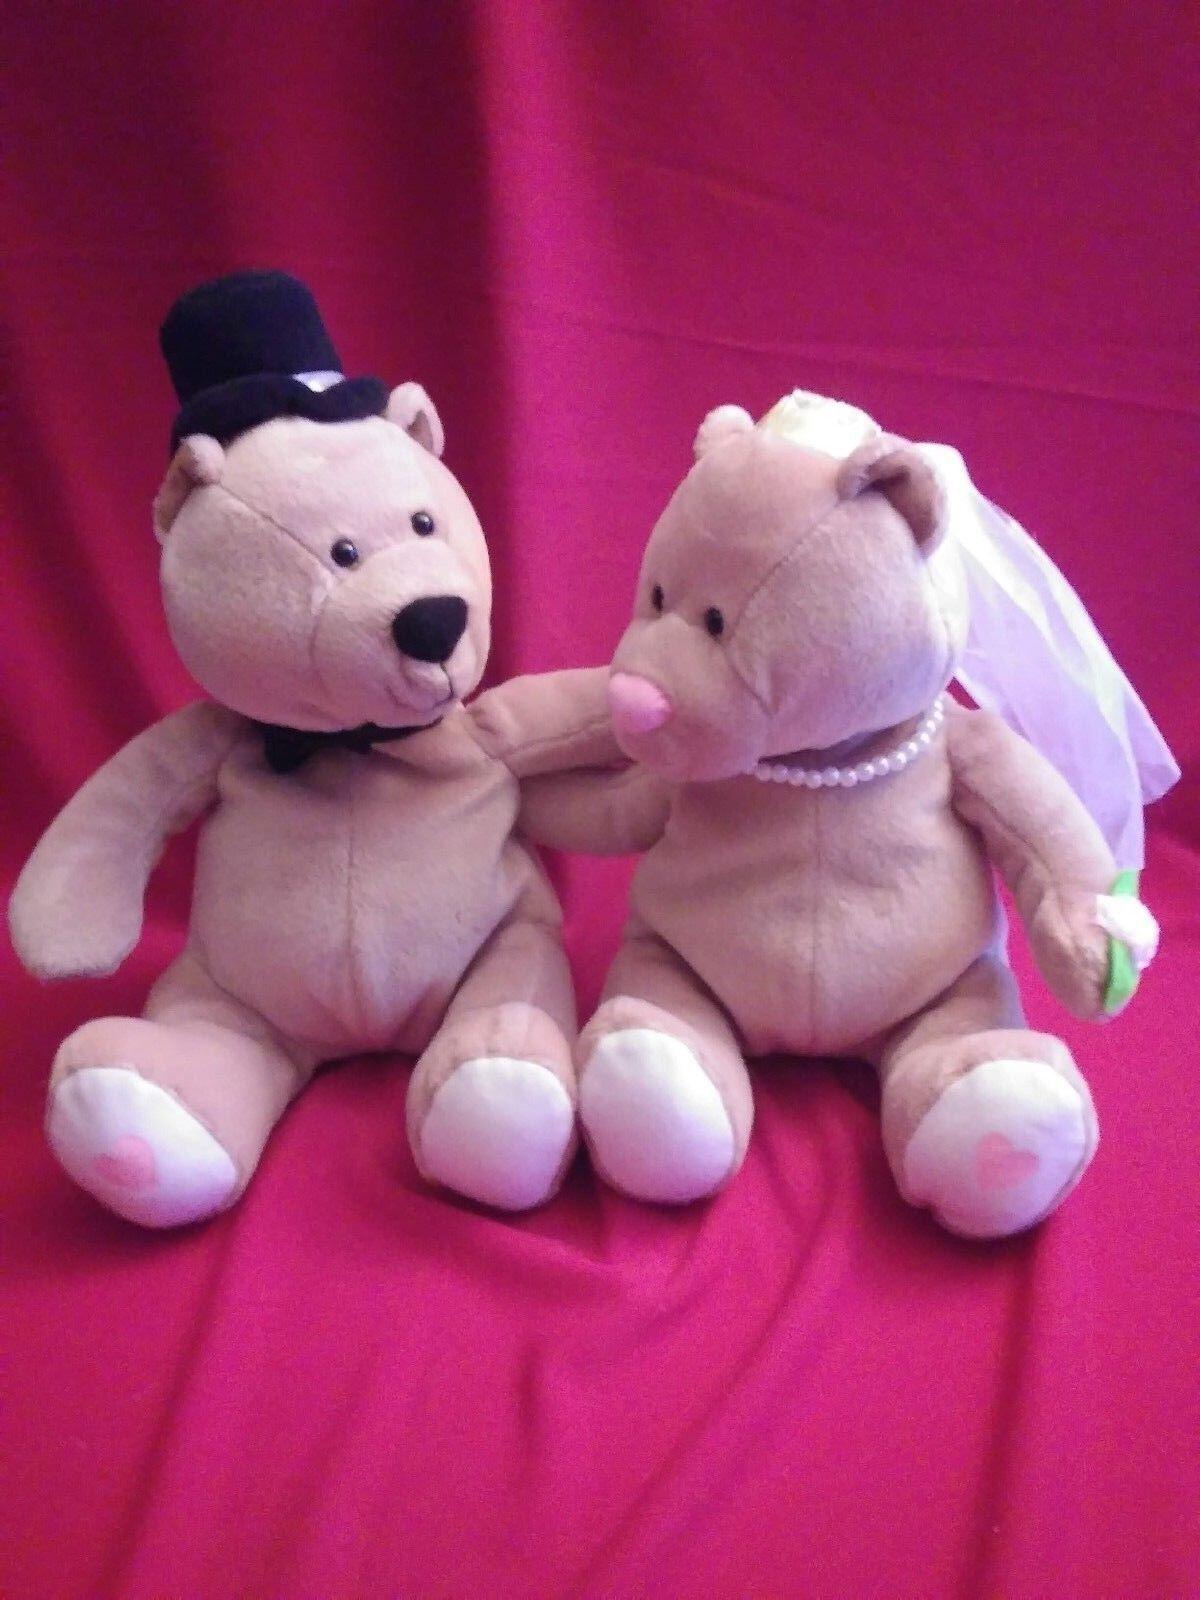 9  RARE Married Couple Teddy Bears Camscan Stuffed Animal Plush Toy